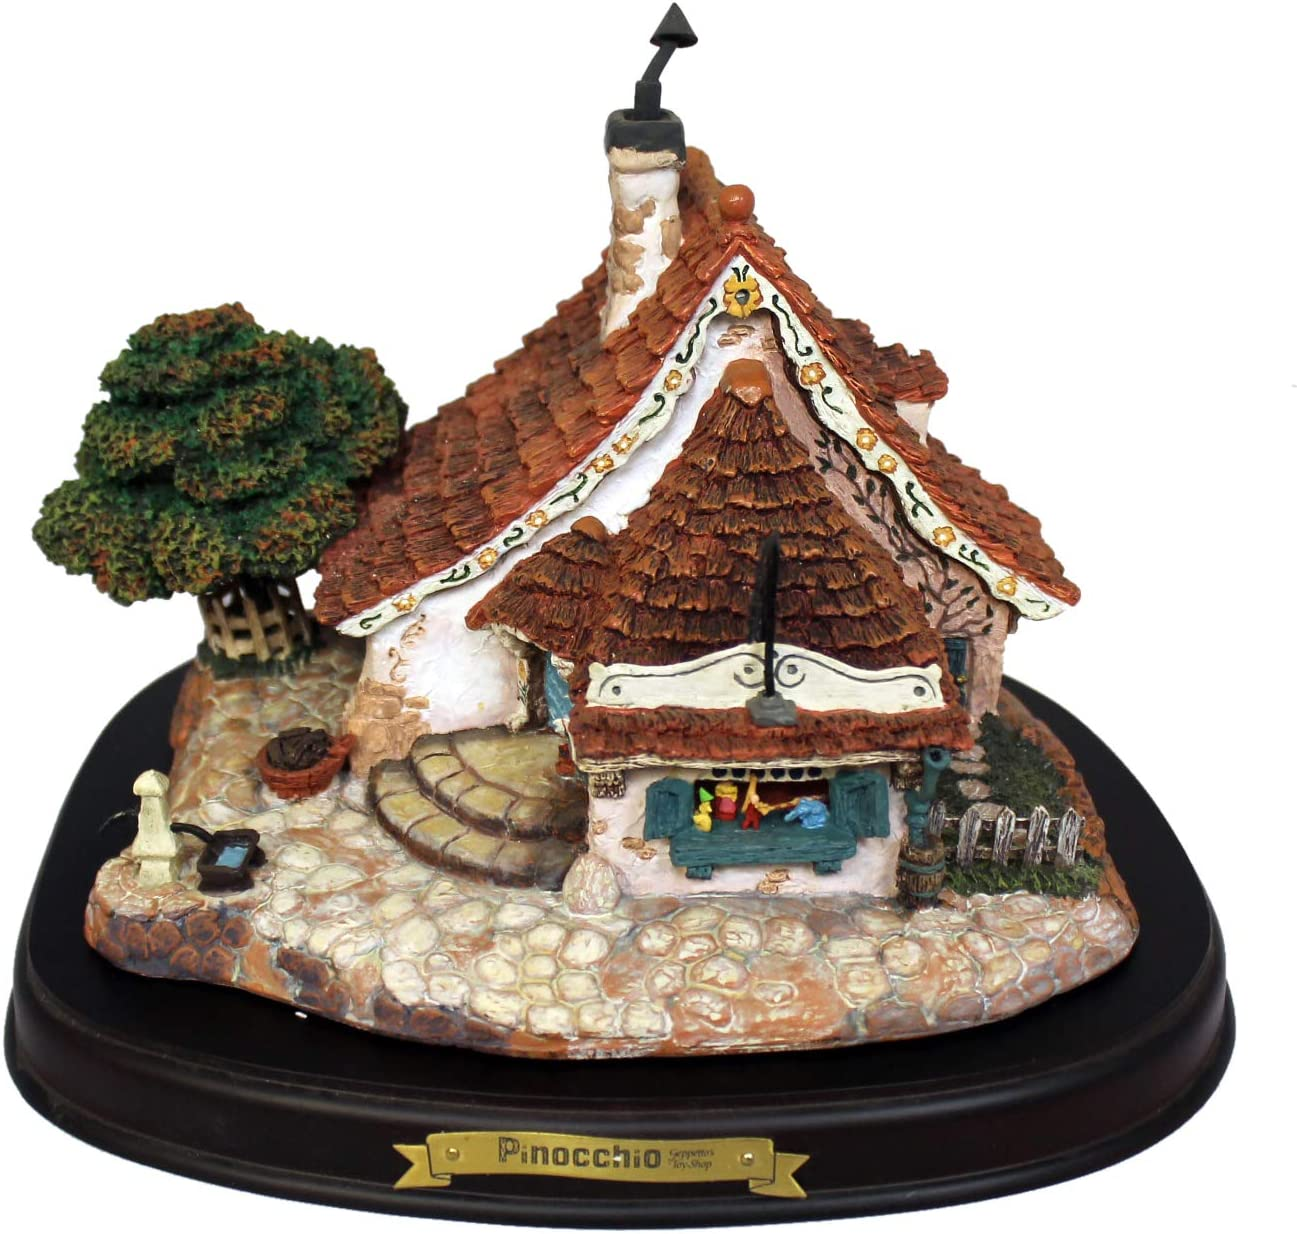 Disney Classics Figurine Gepetto Toy Shop, Model 41207